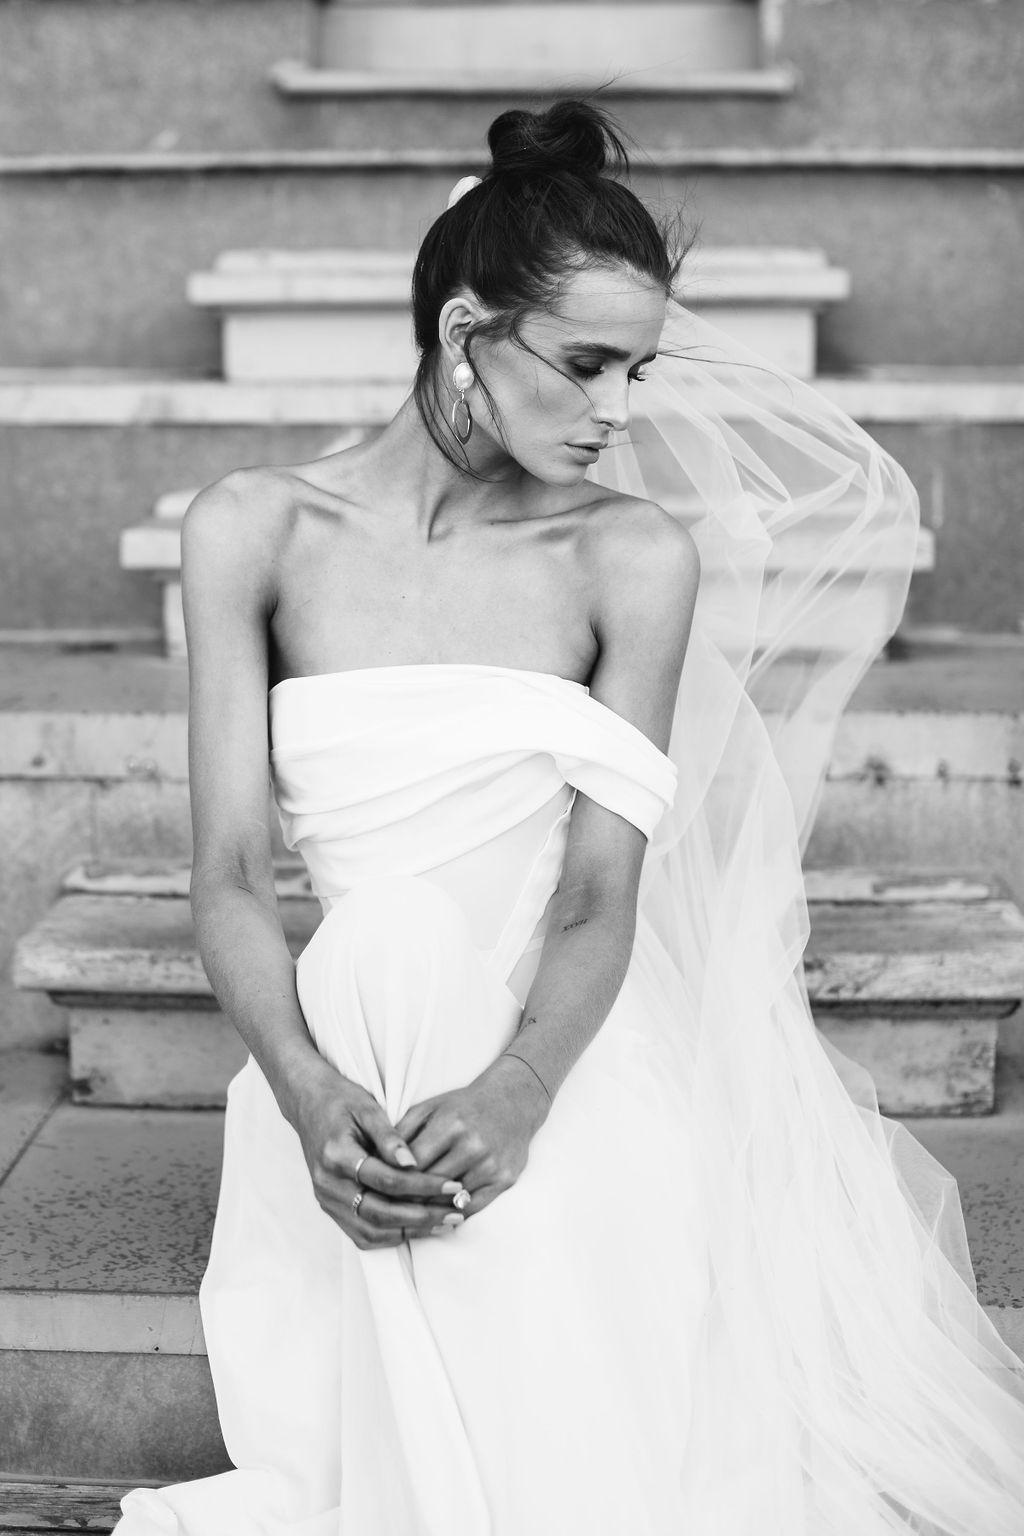 bridal-and-wedding-earrings-maleny-large-gold-pearl-statement-wedding-earrings-118.jpg